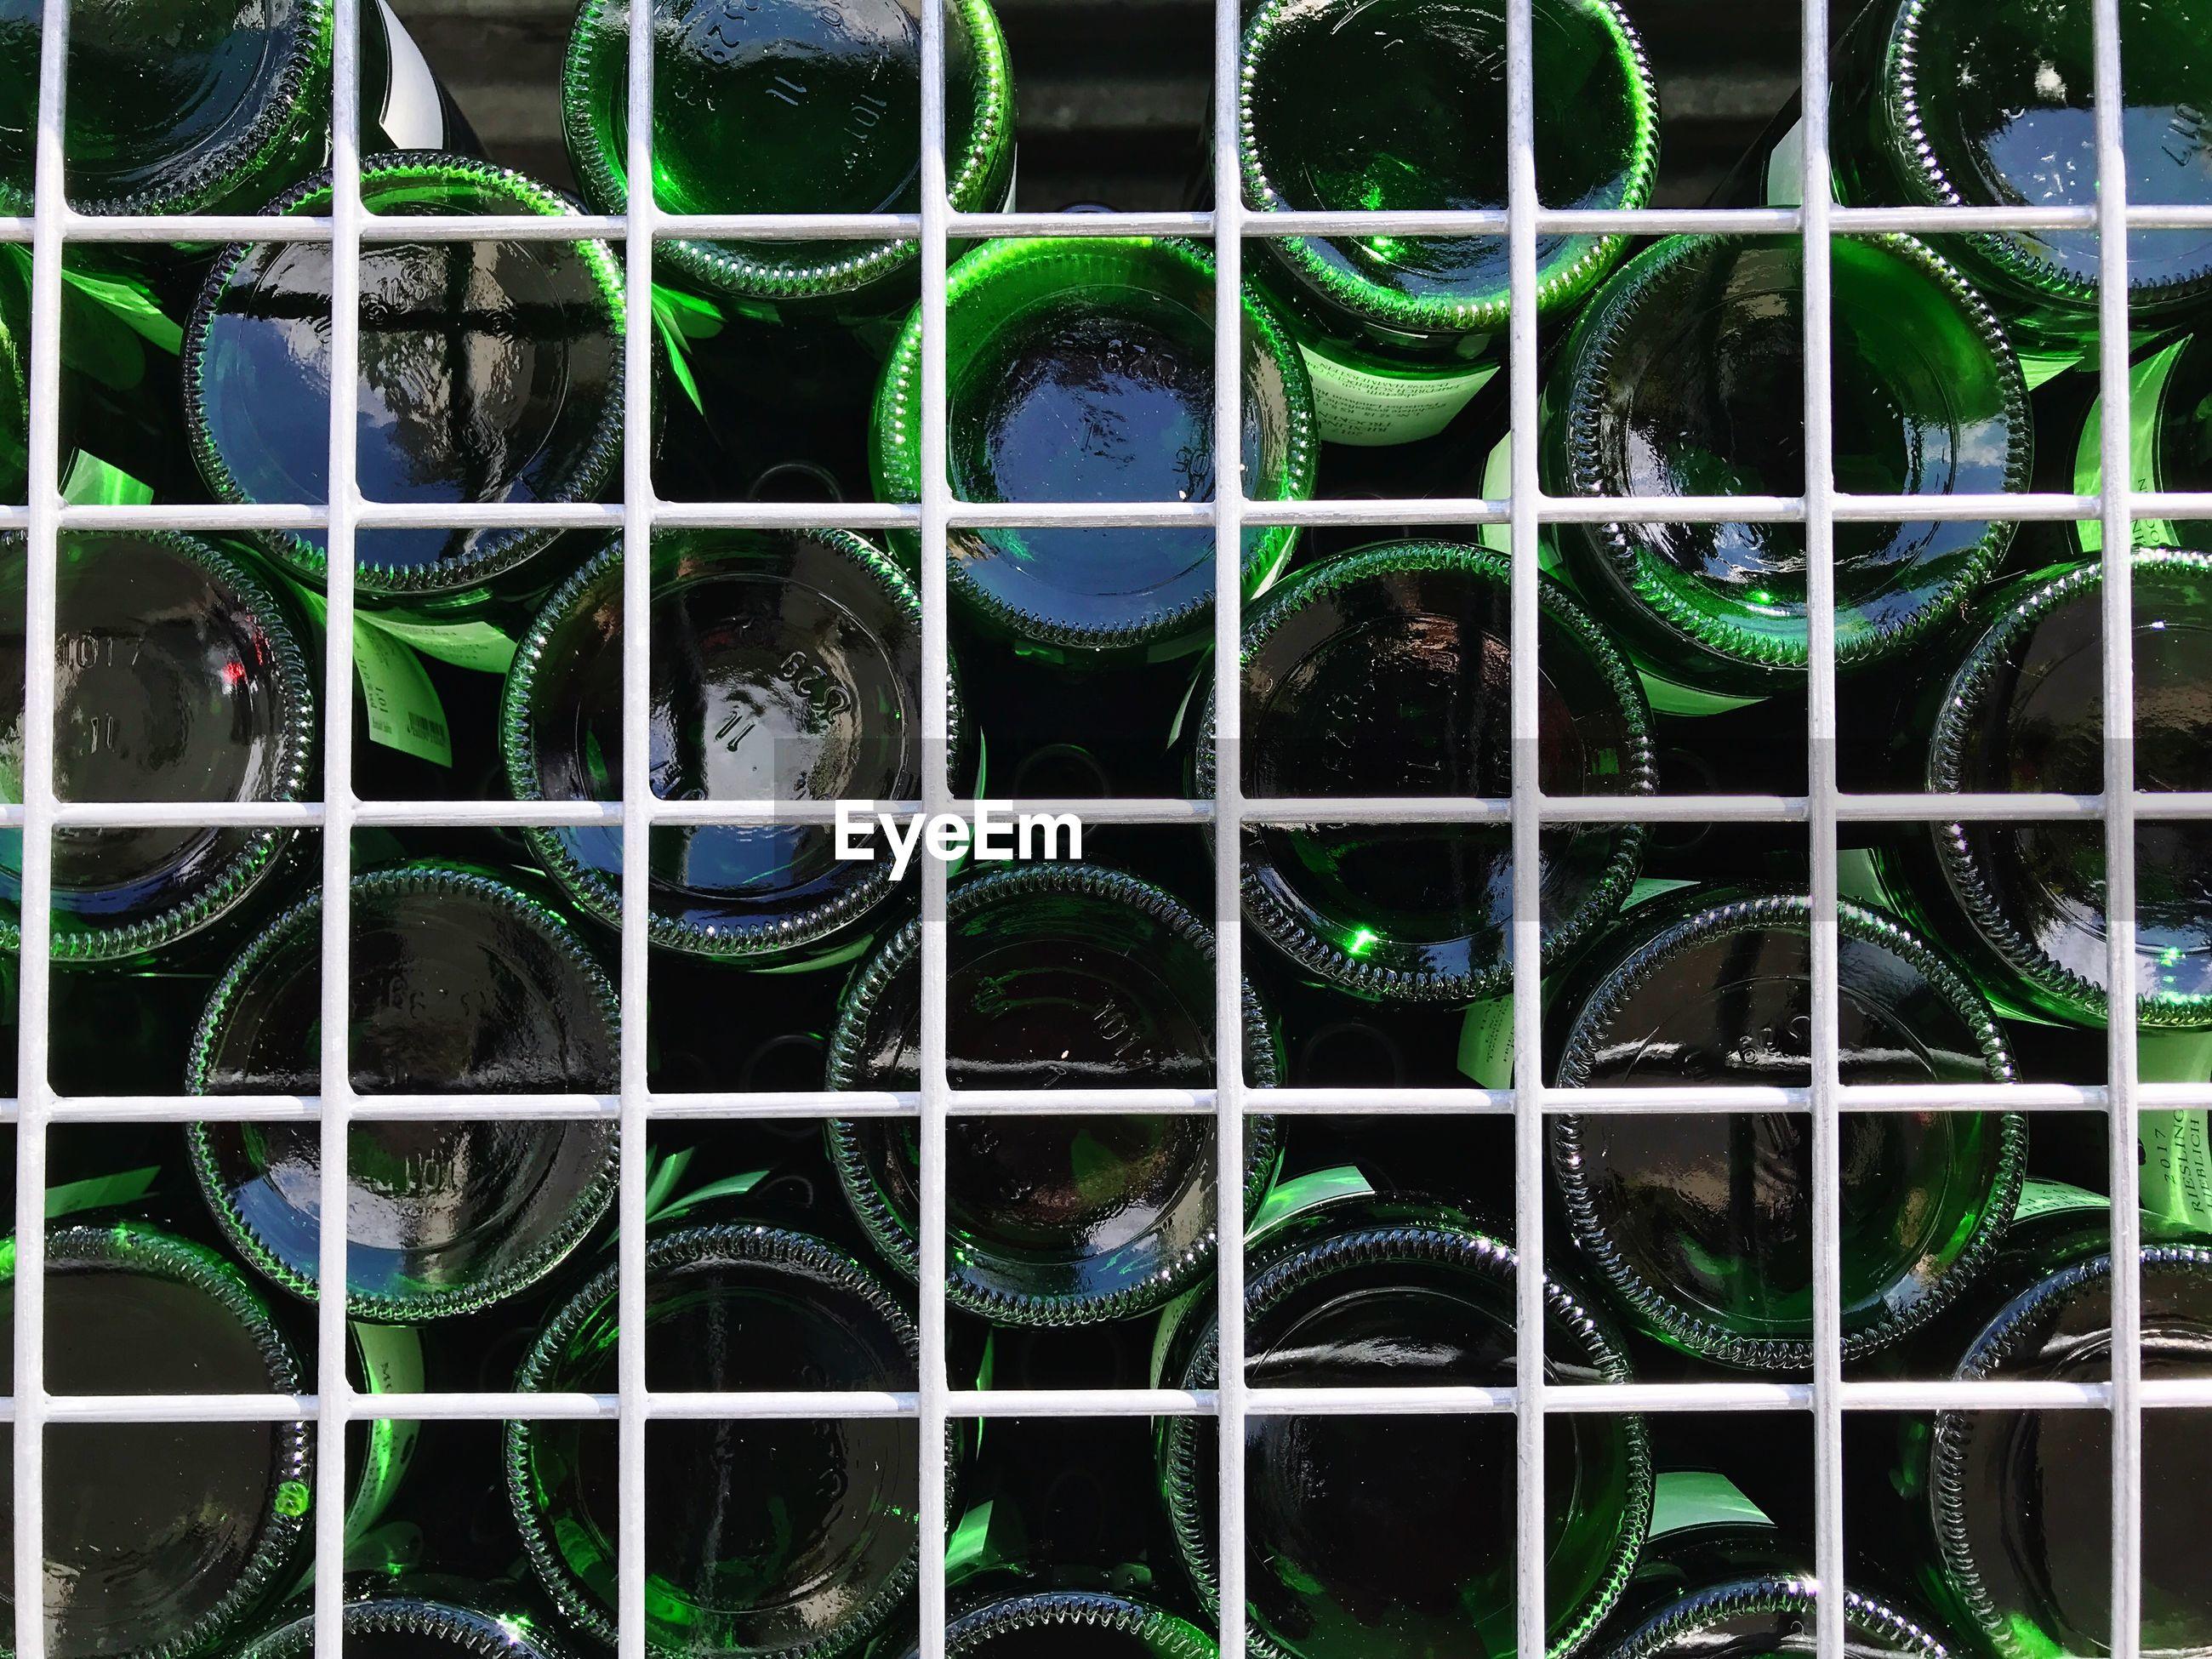 Close-up of bottles seen through metal grate